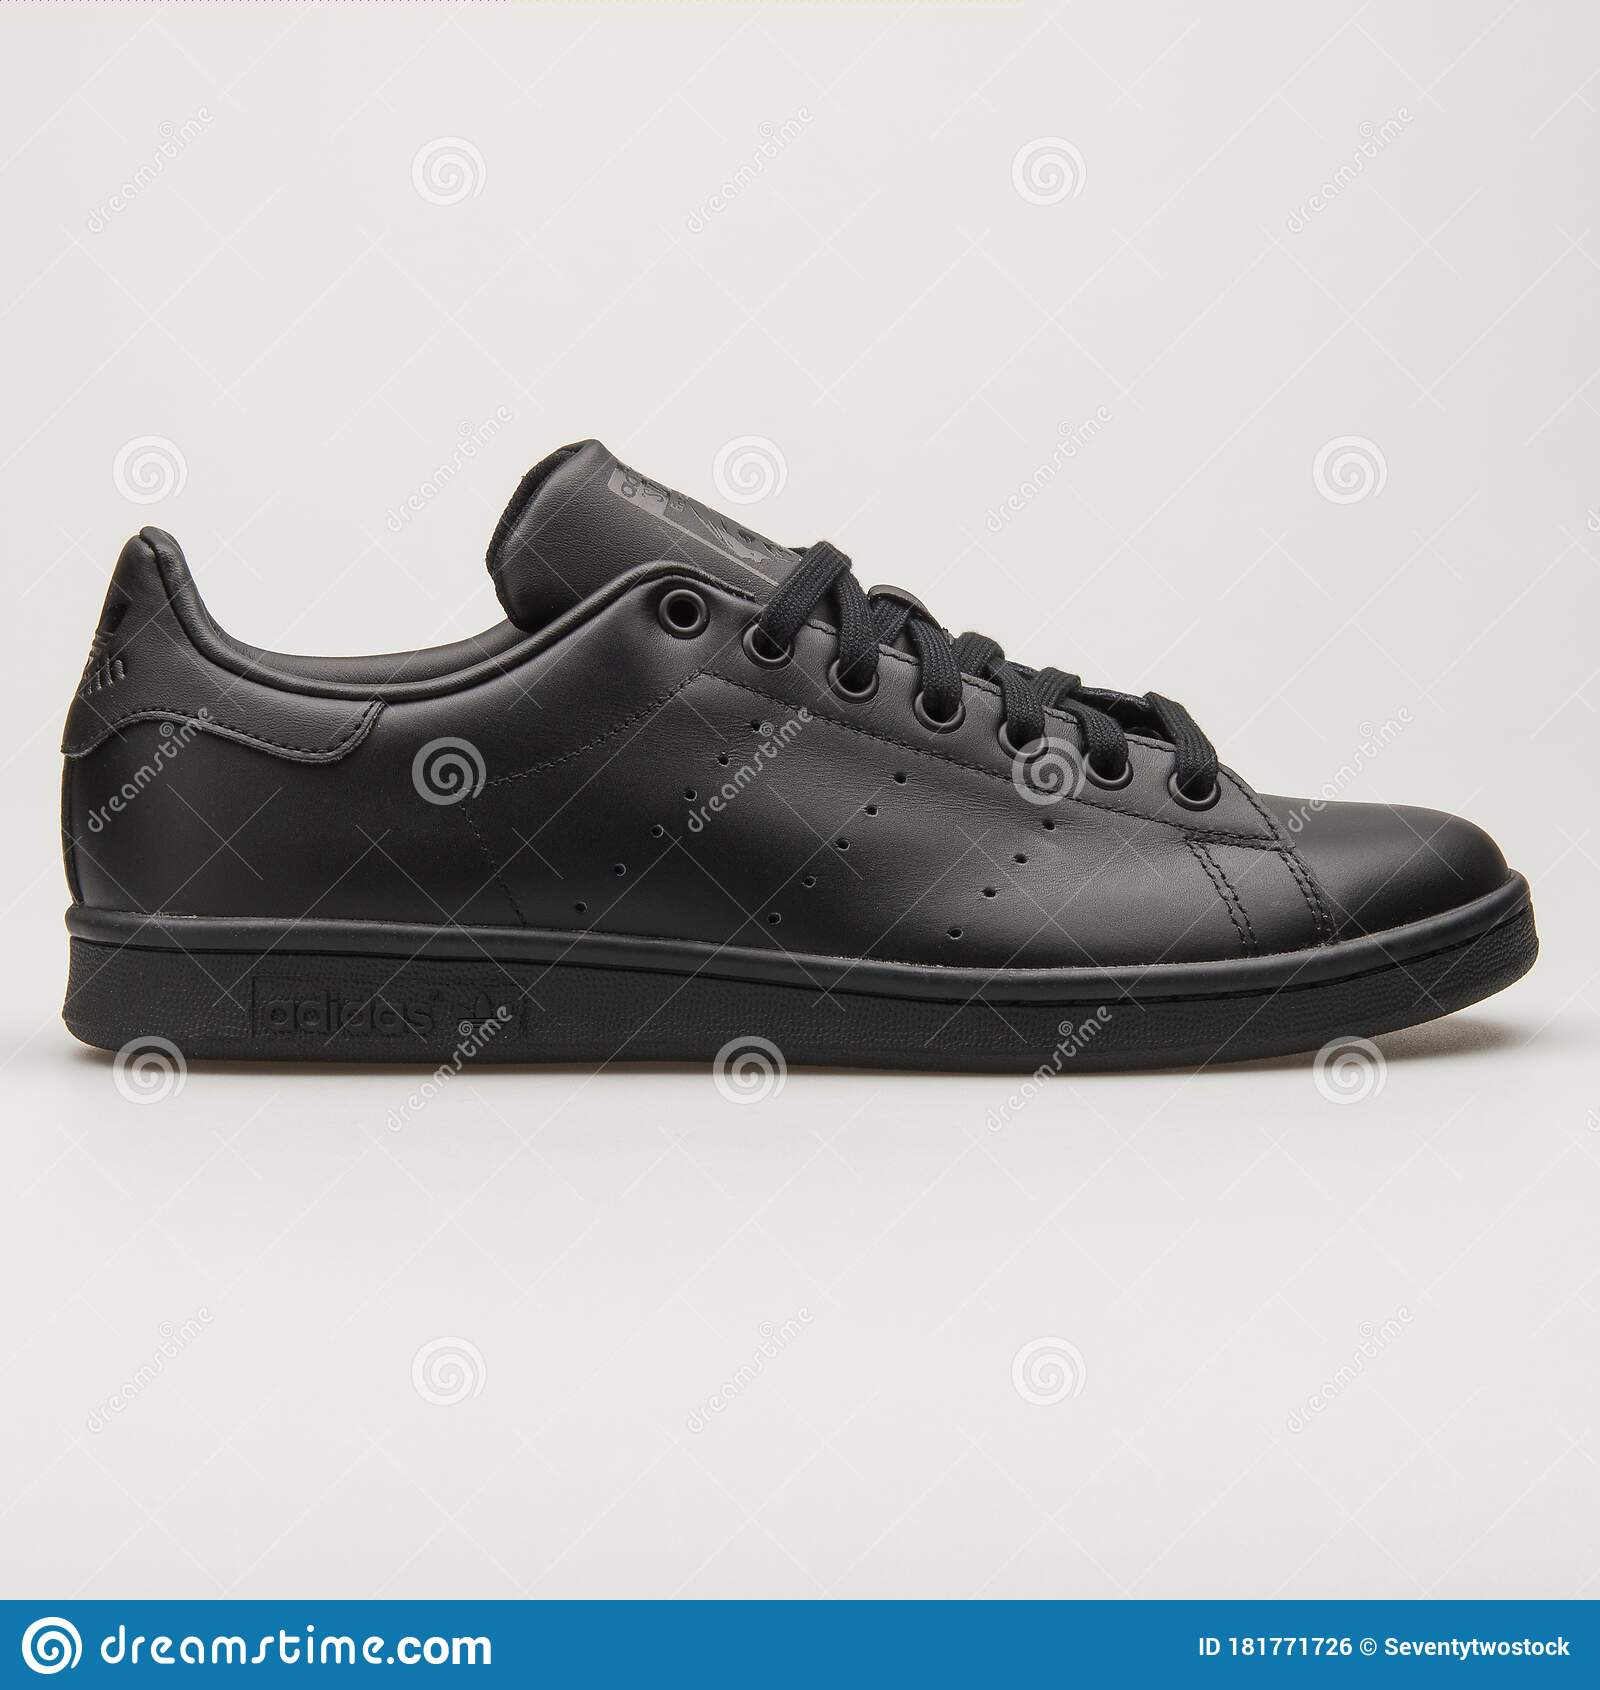 Adidas Stan Smith Black Sneaker